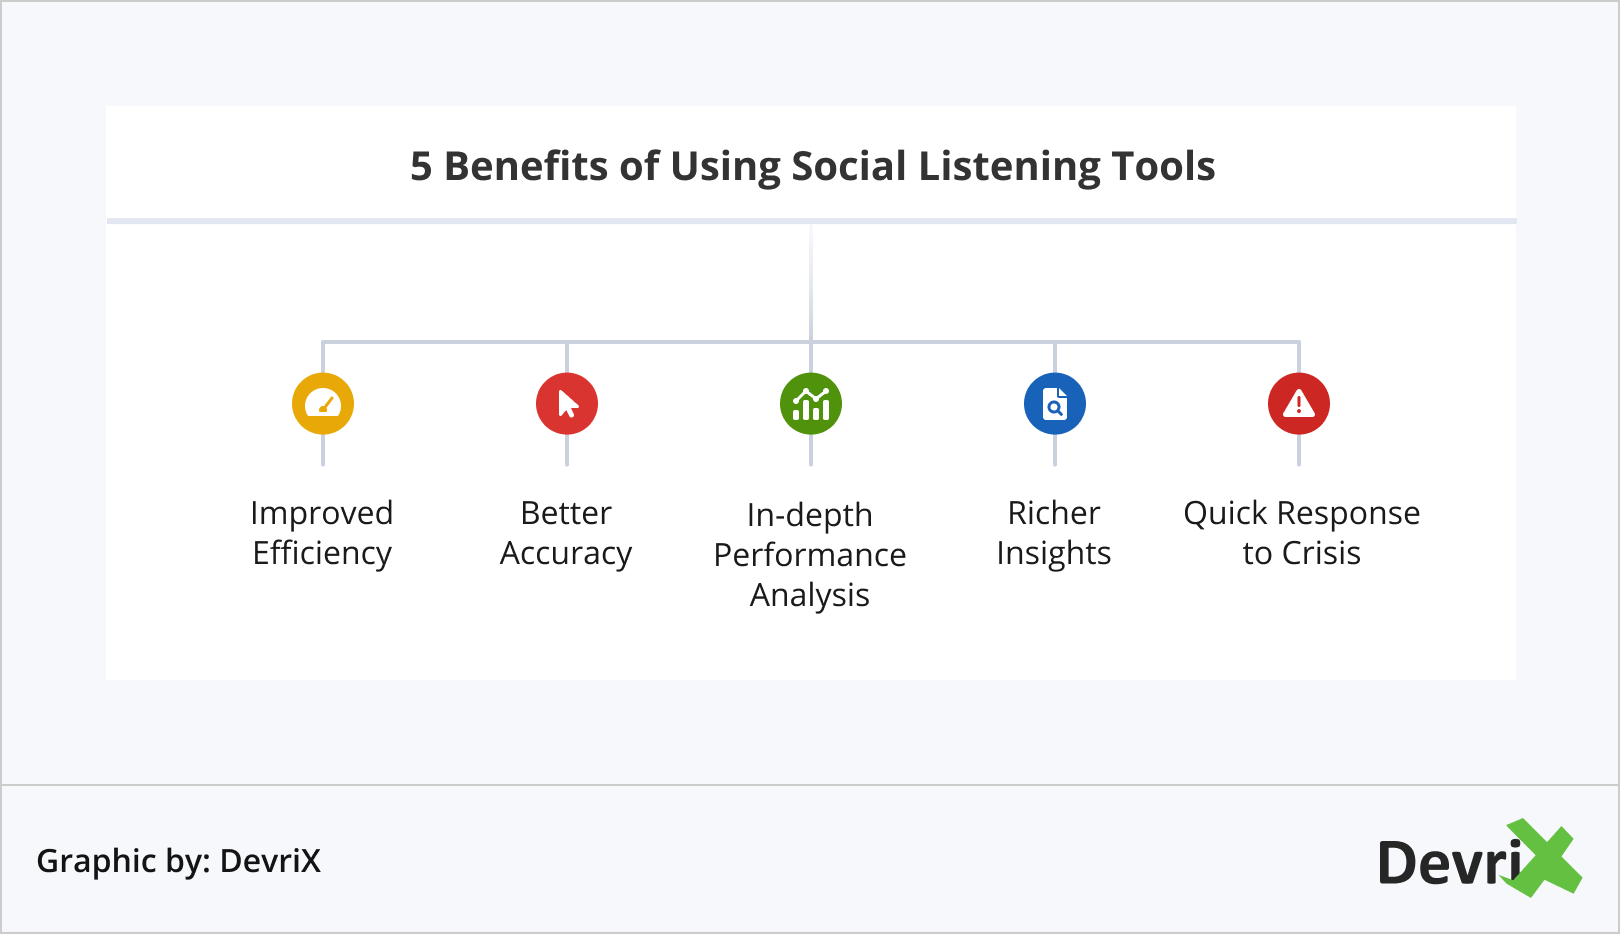 5 Benefits of Using Social Listening Tools